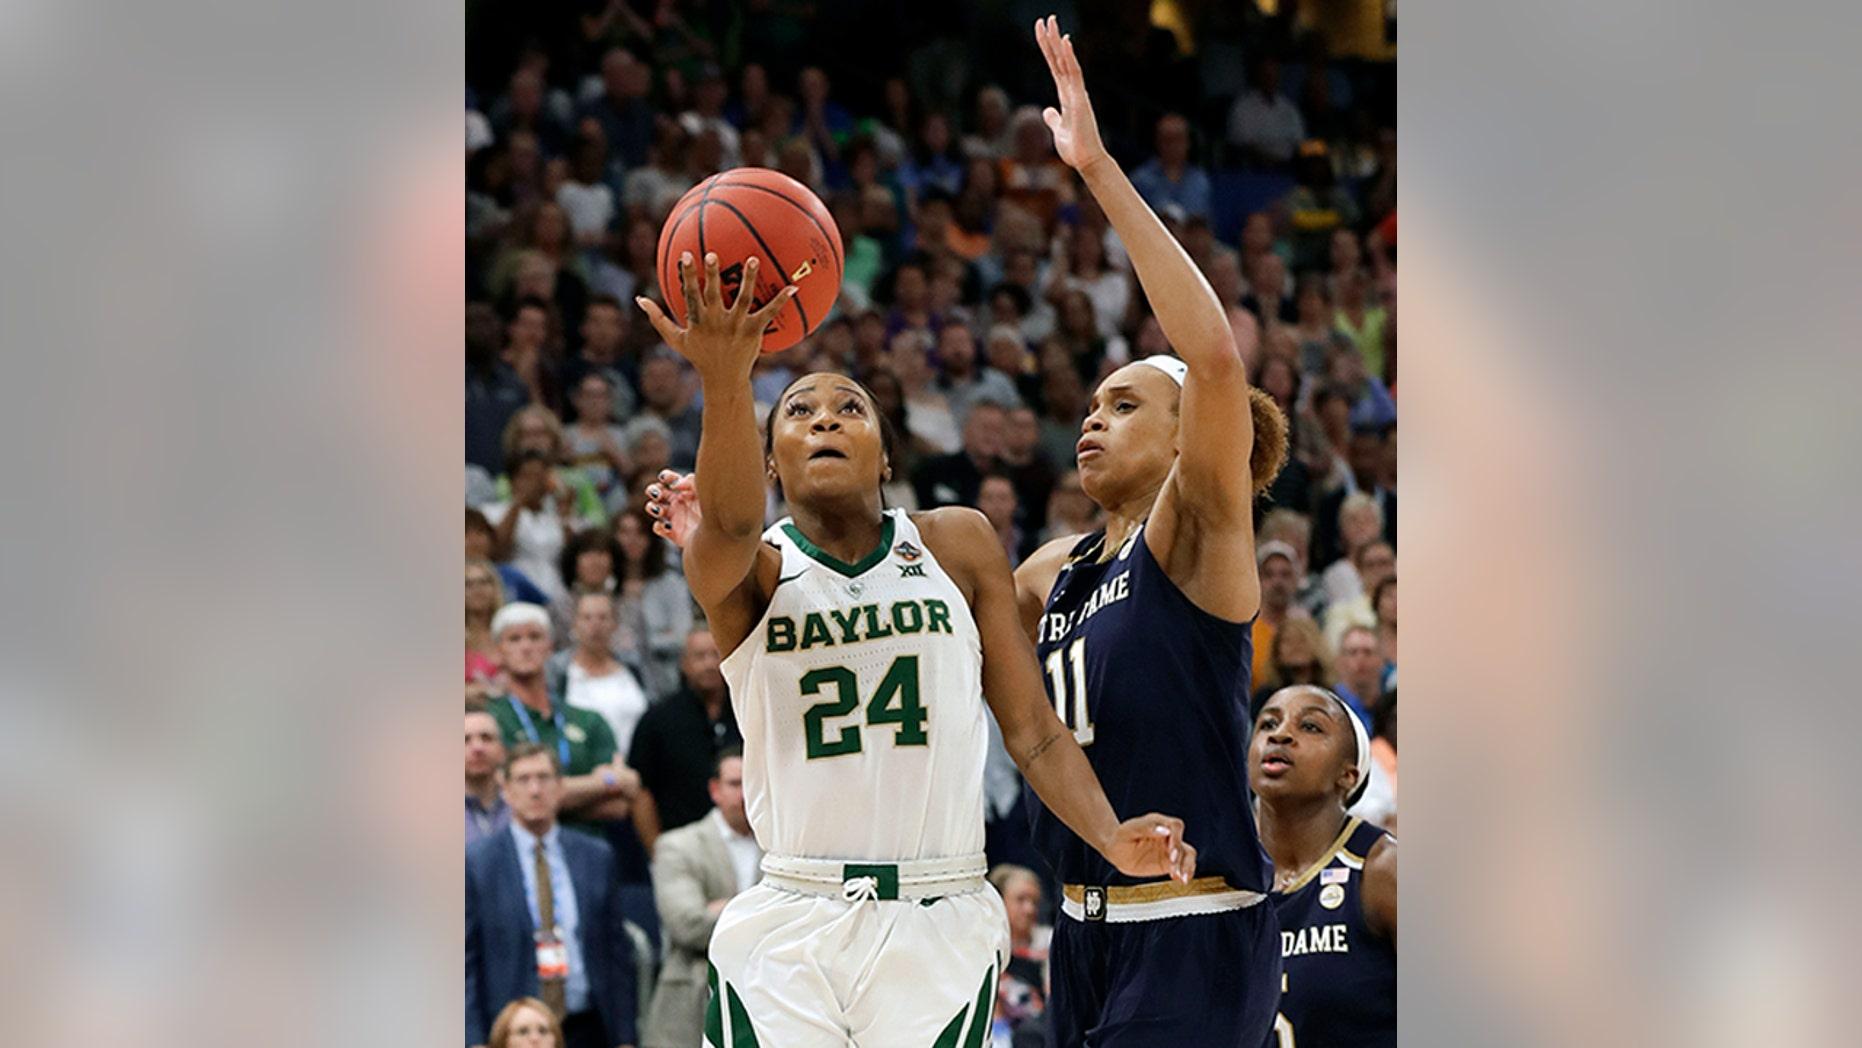 Baylor guard Chloe Jackson (24) scoring the go-ahead basket in Sunday's championship game. (AP Photo/Chris O'Meara)